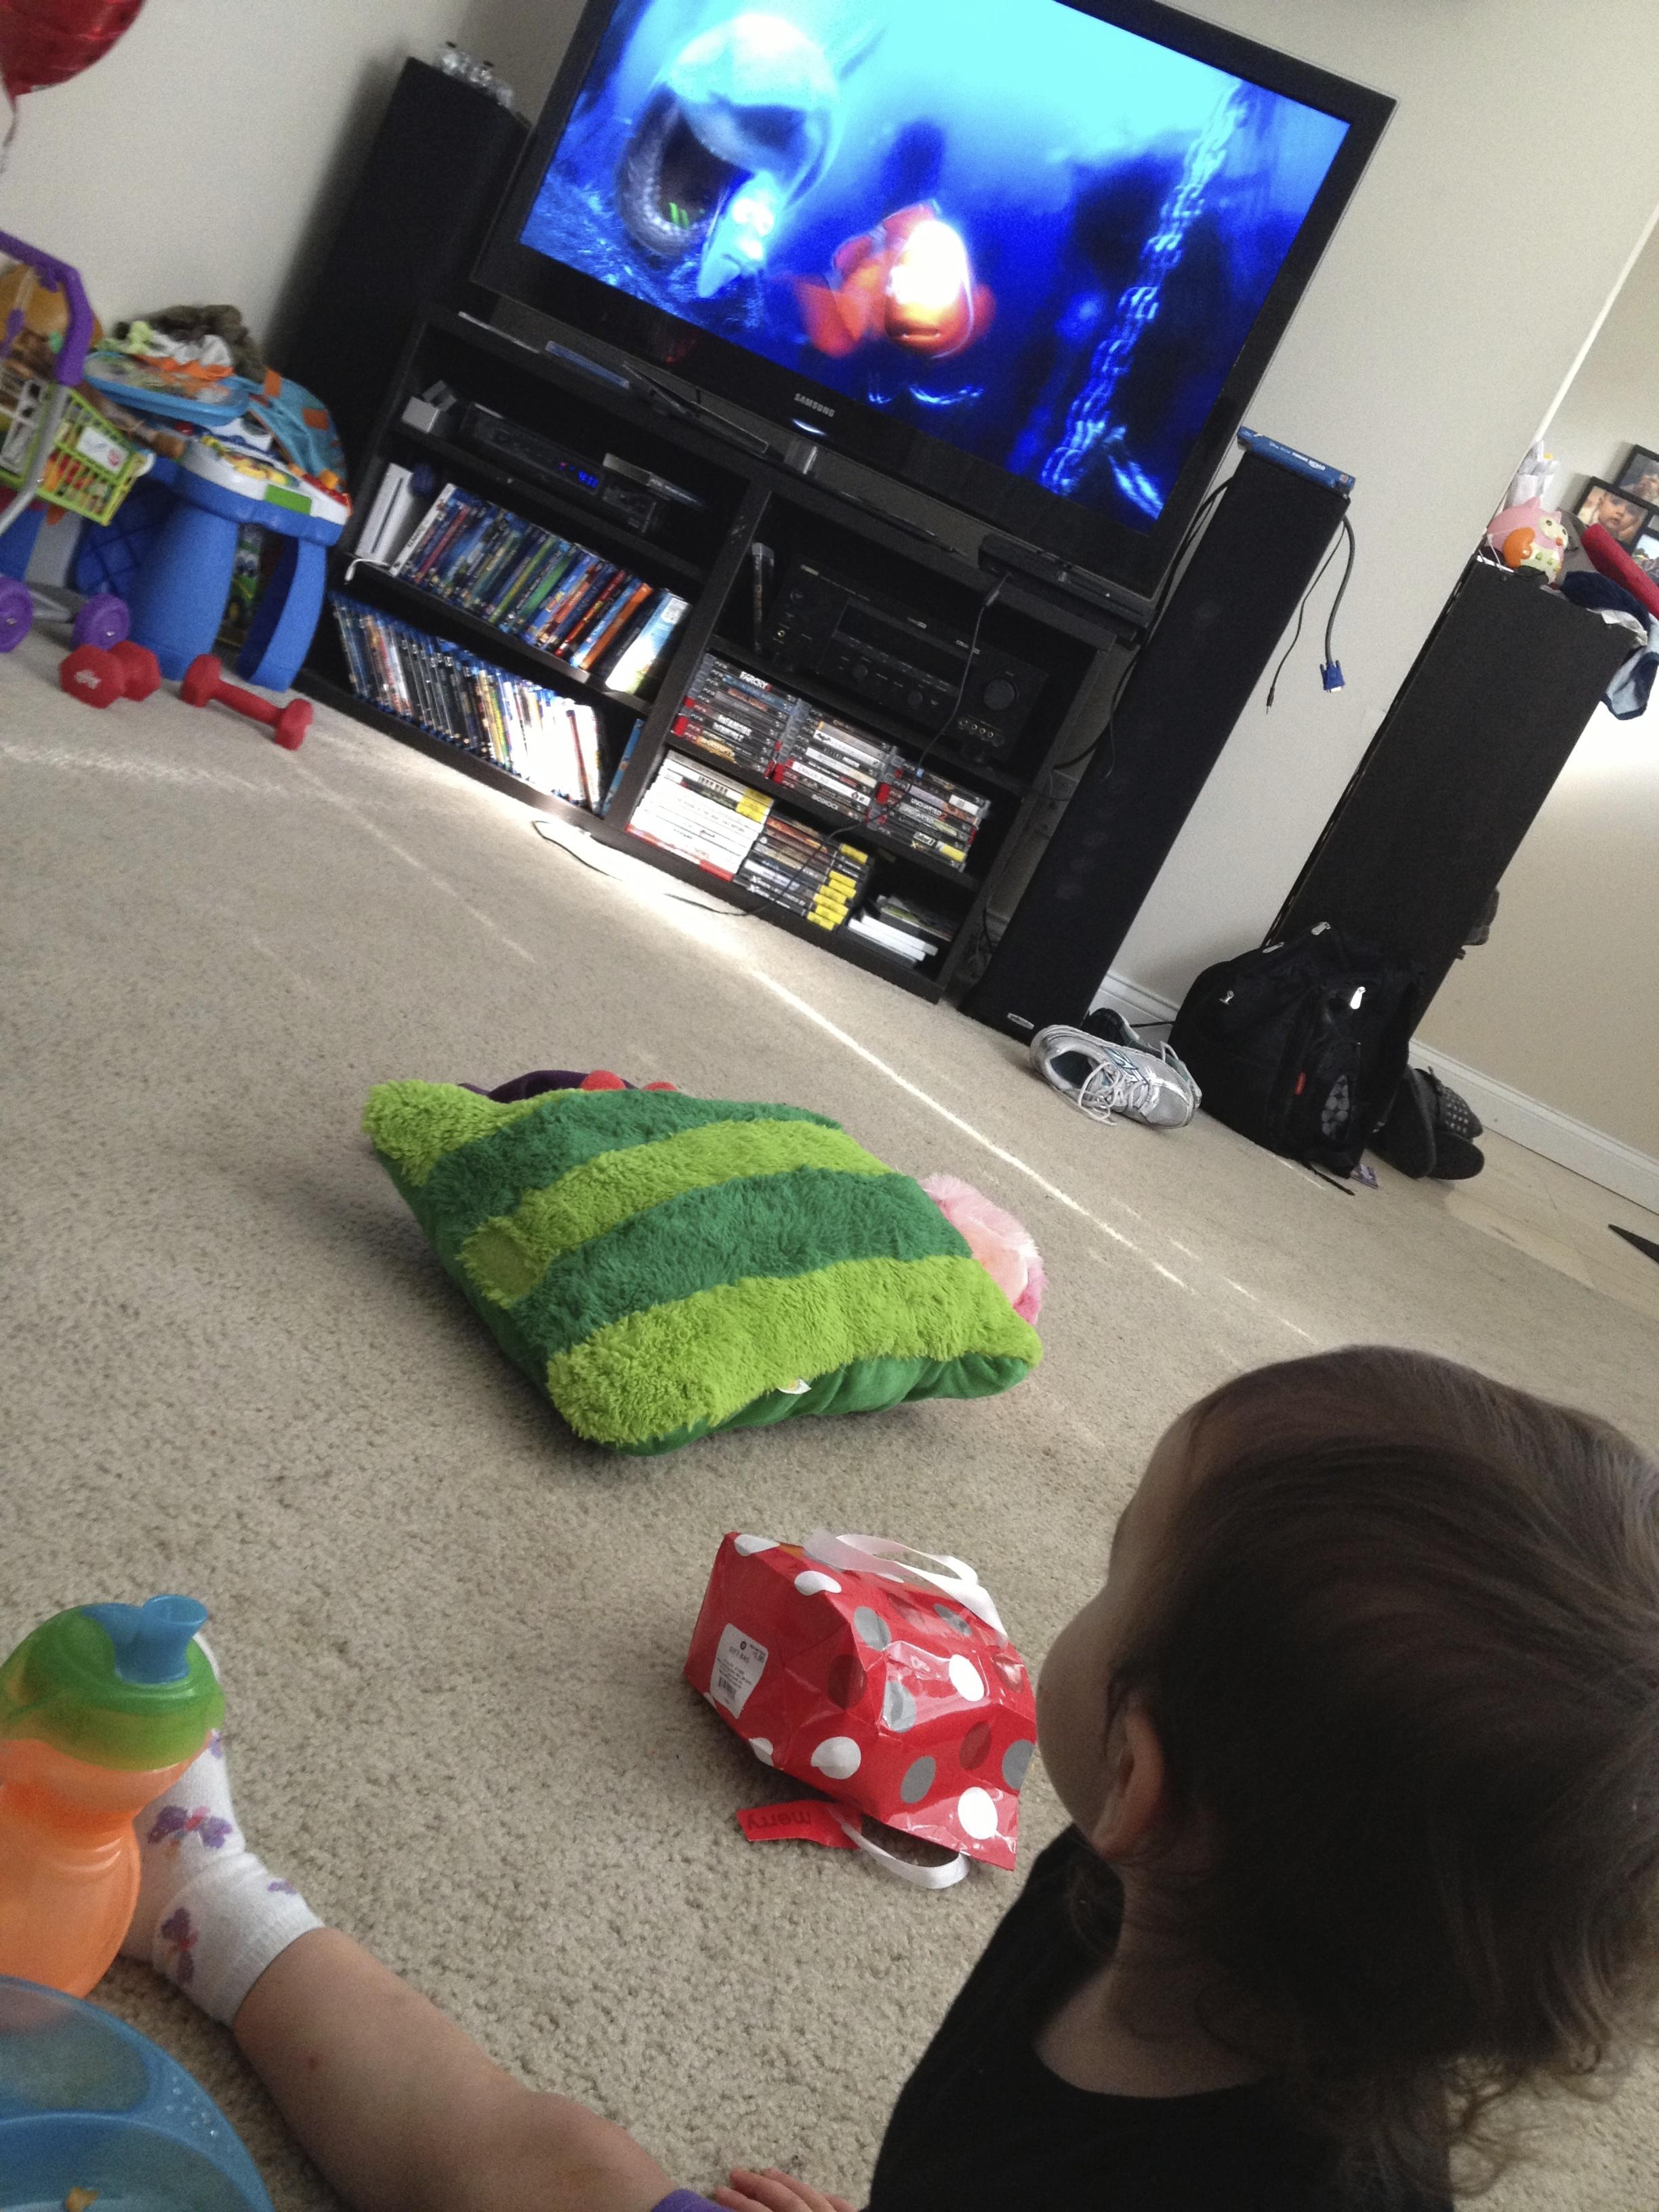 Finding Nemo, Mommy's Favorite Pixar